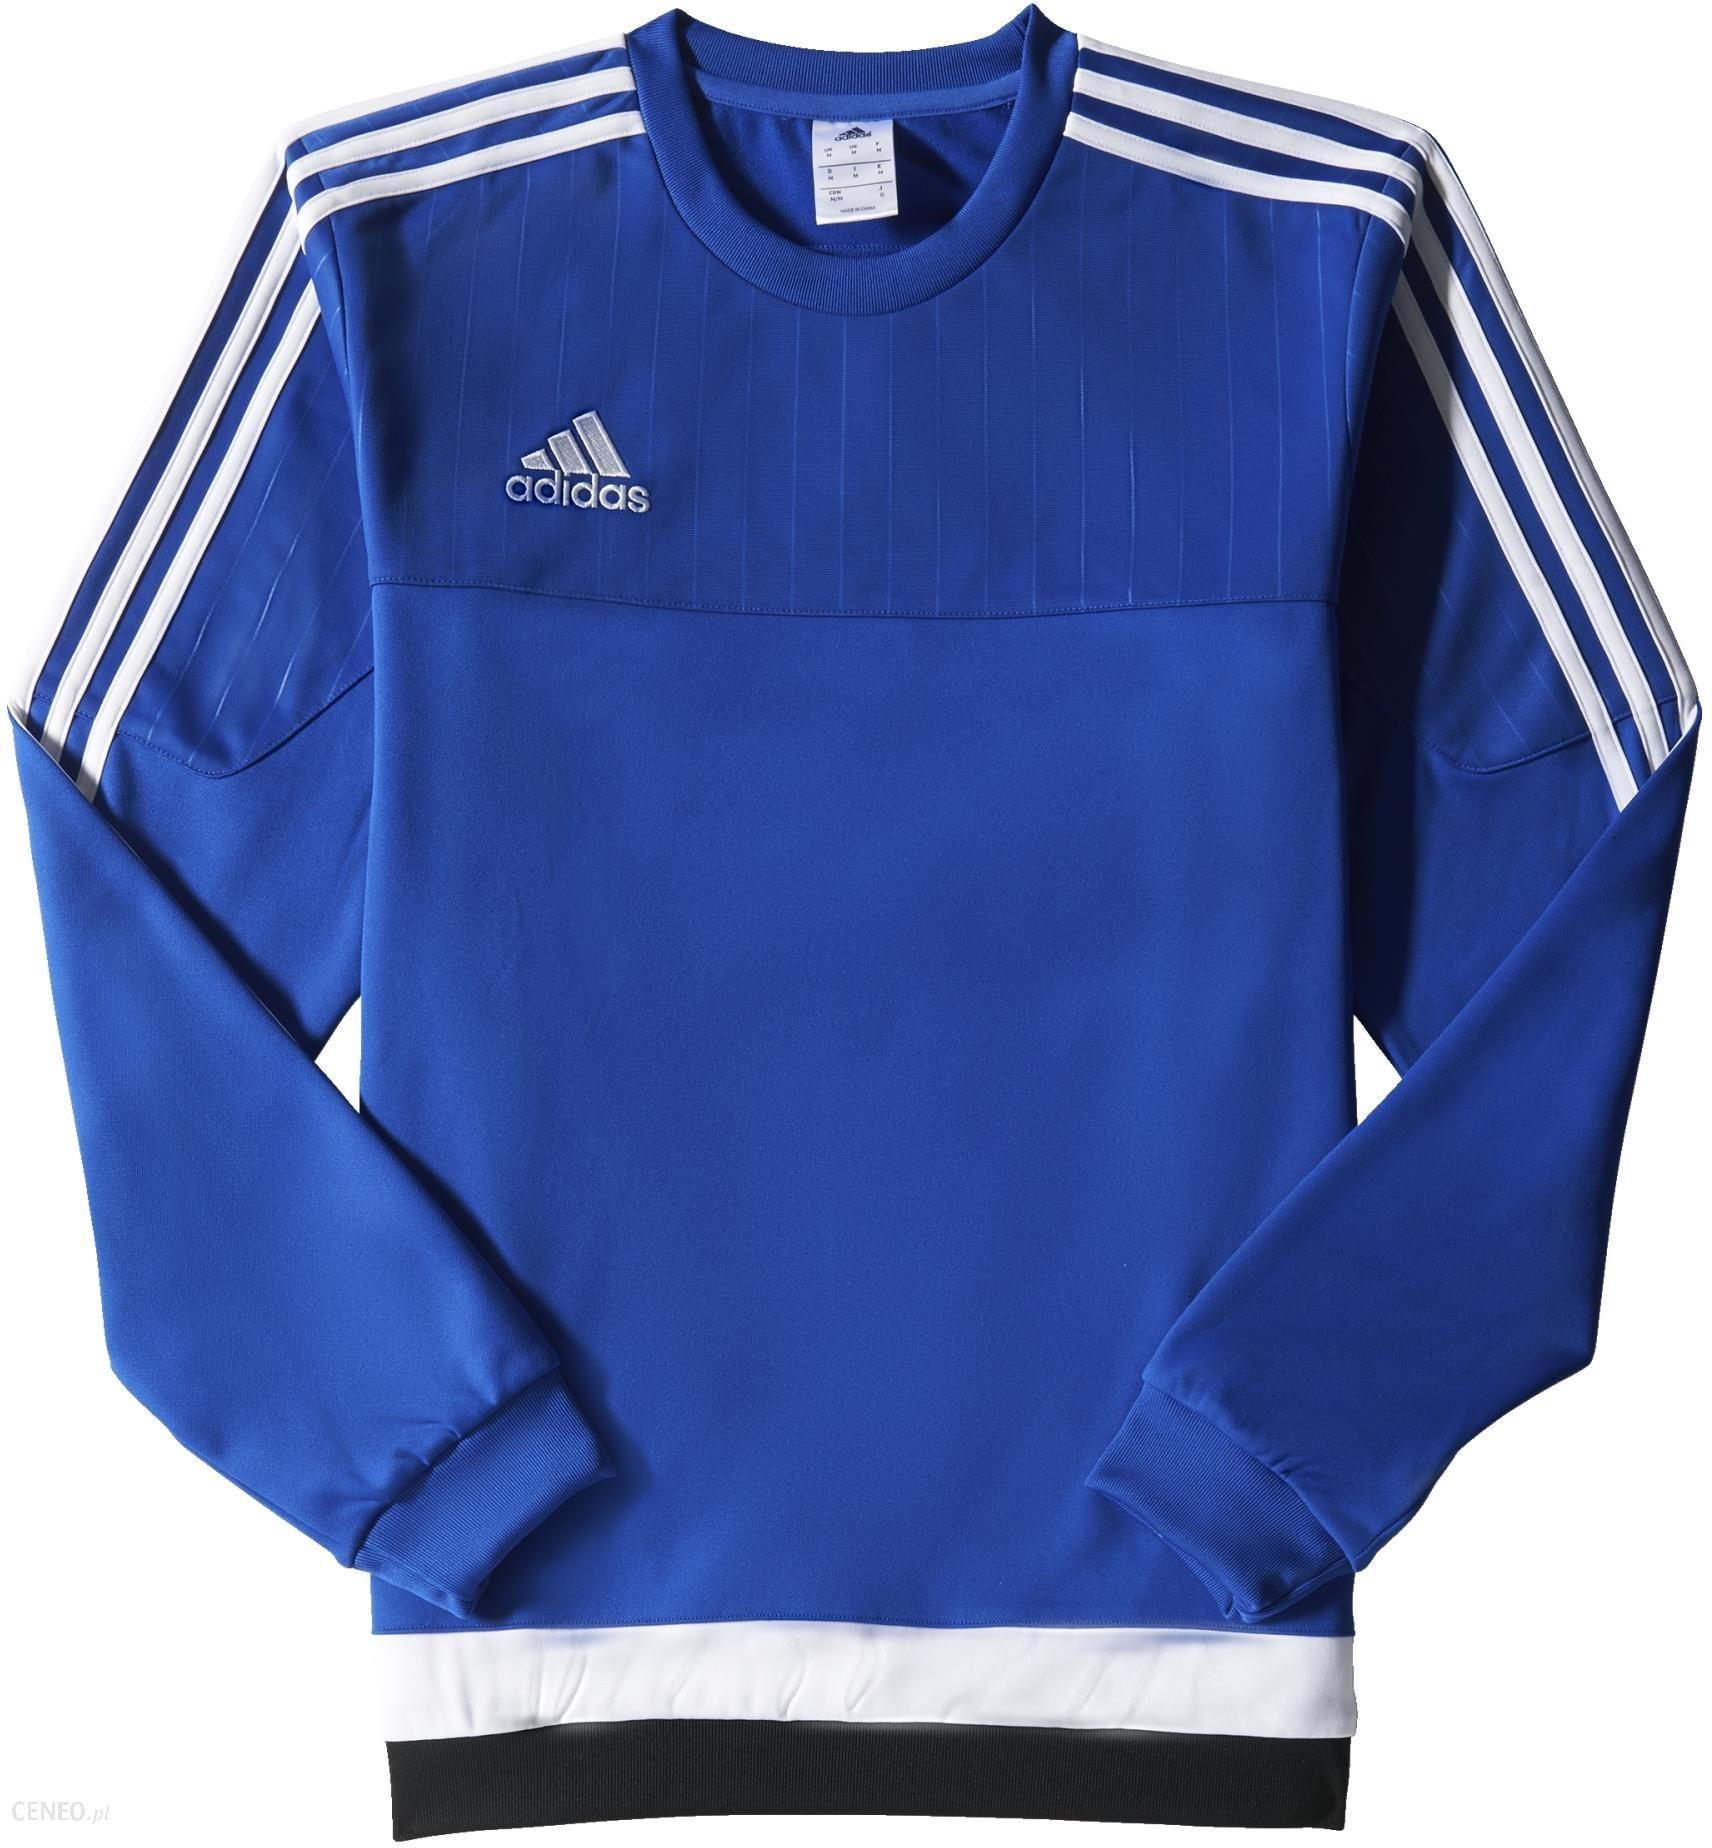 bluza adidas niebieska męska